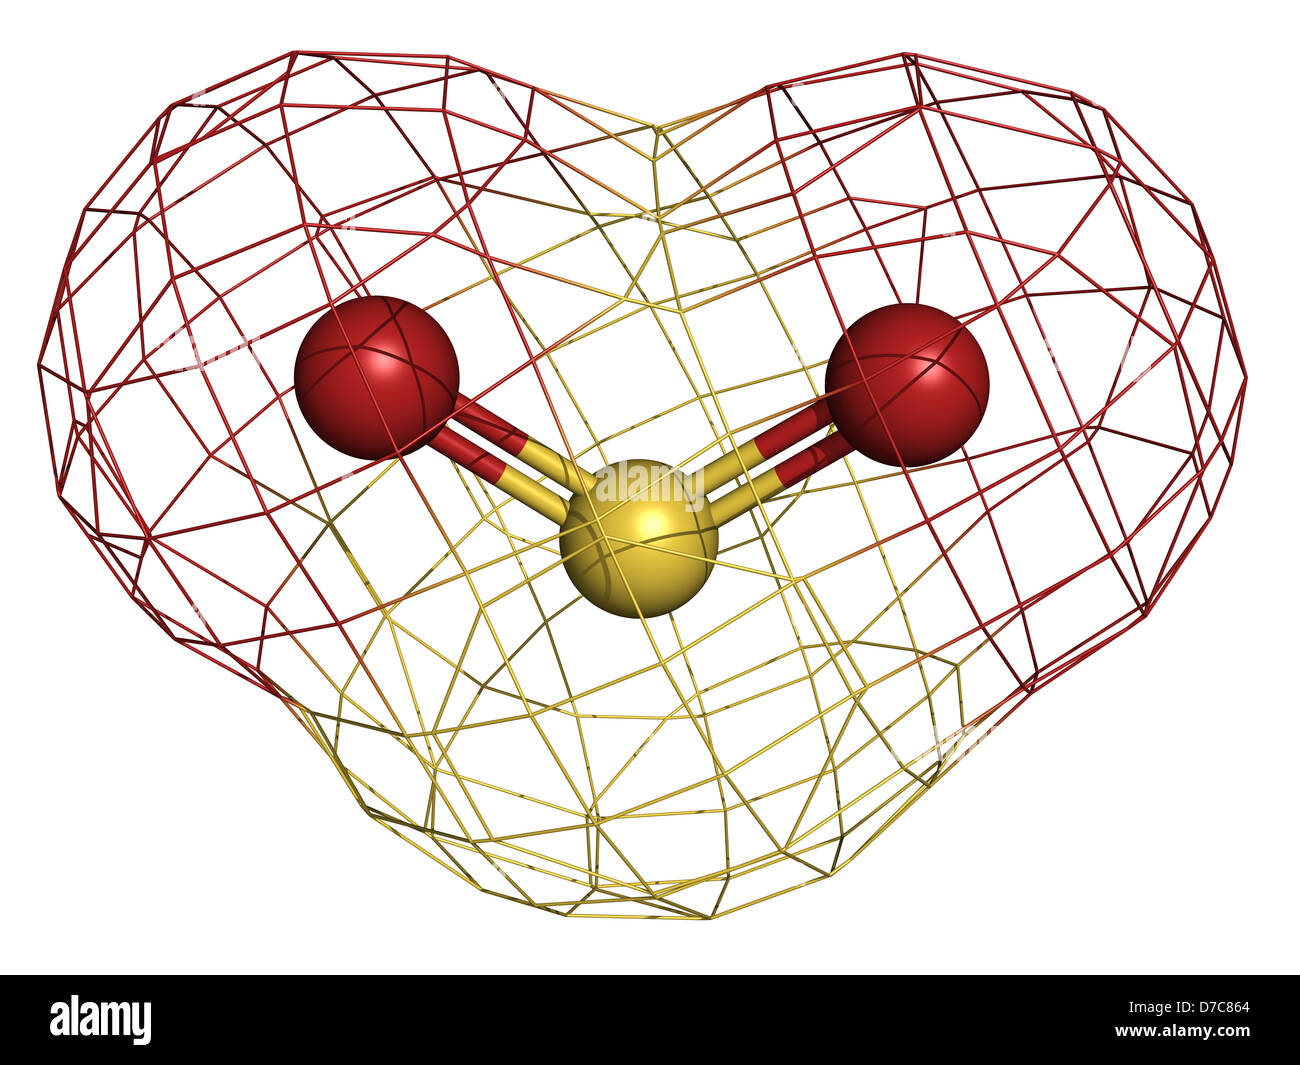 Sulfur dioxide (sulphur dioxide, SO2) gas, molecular model. - Stock Image